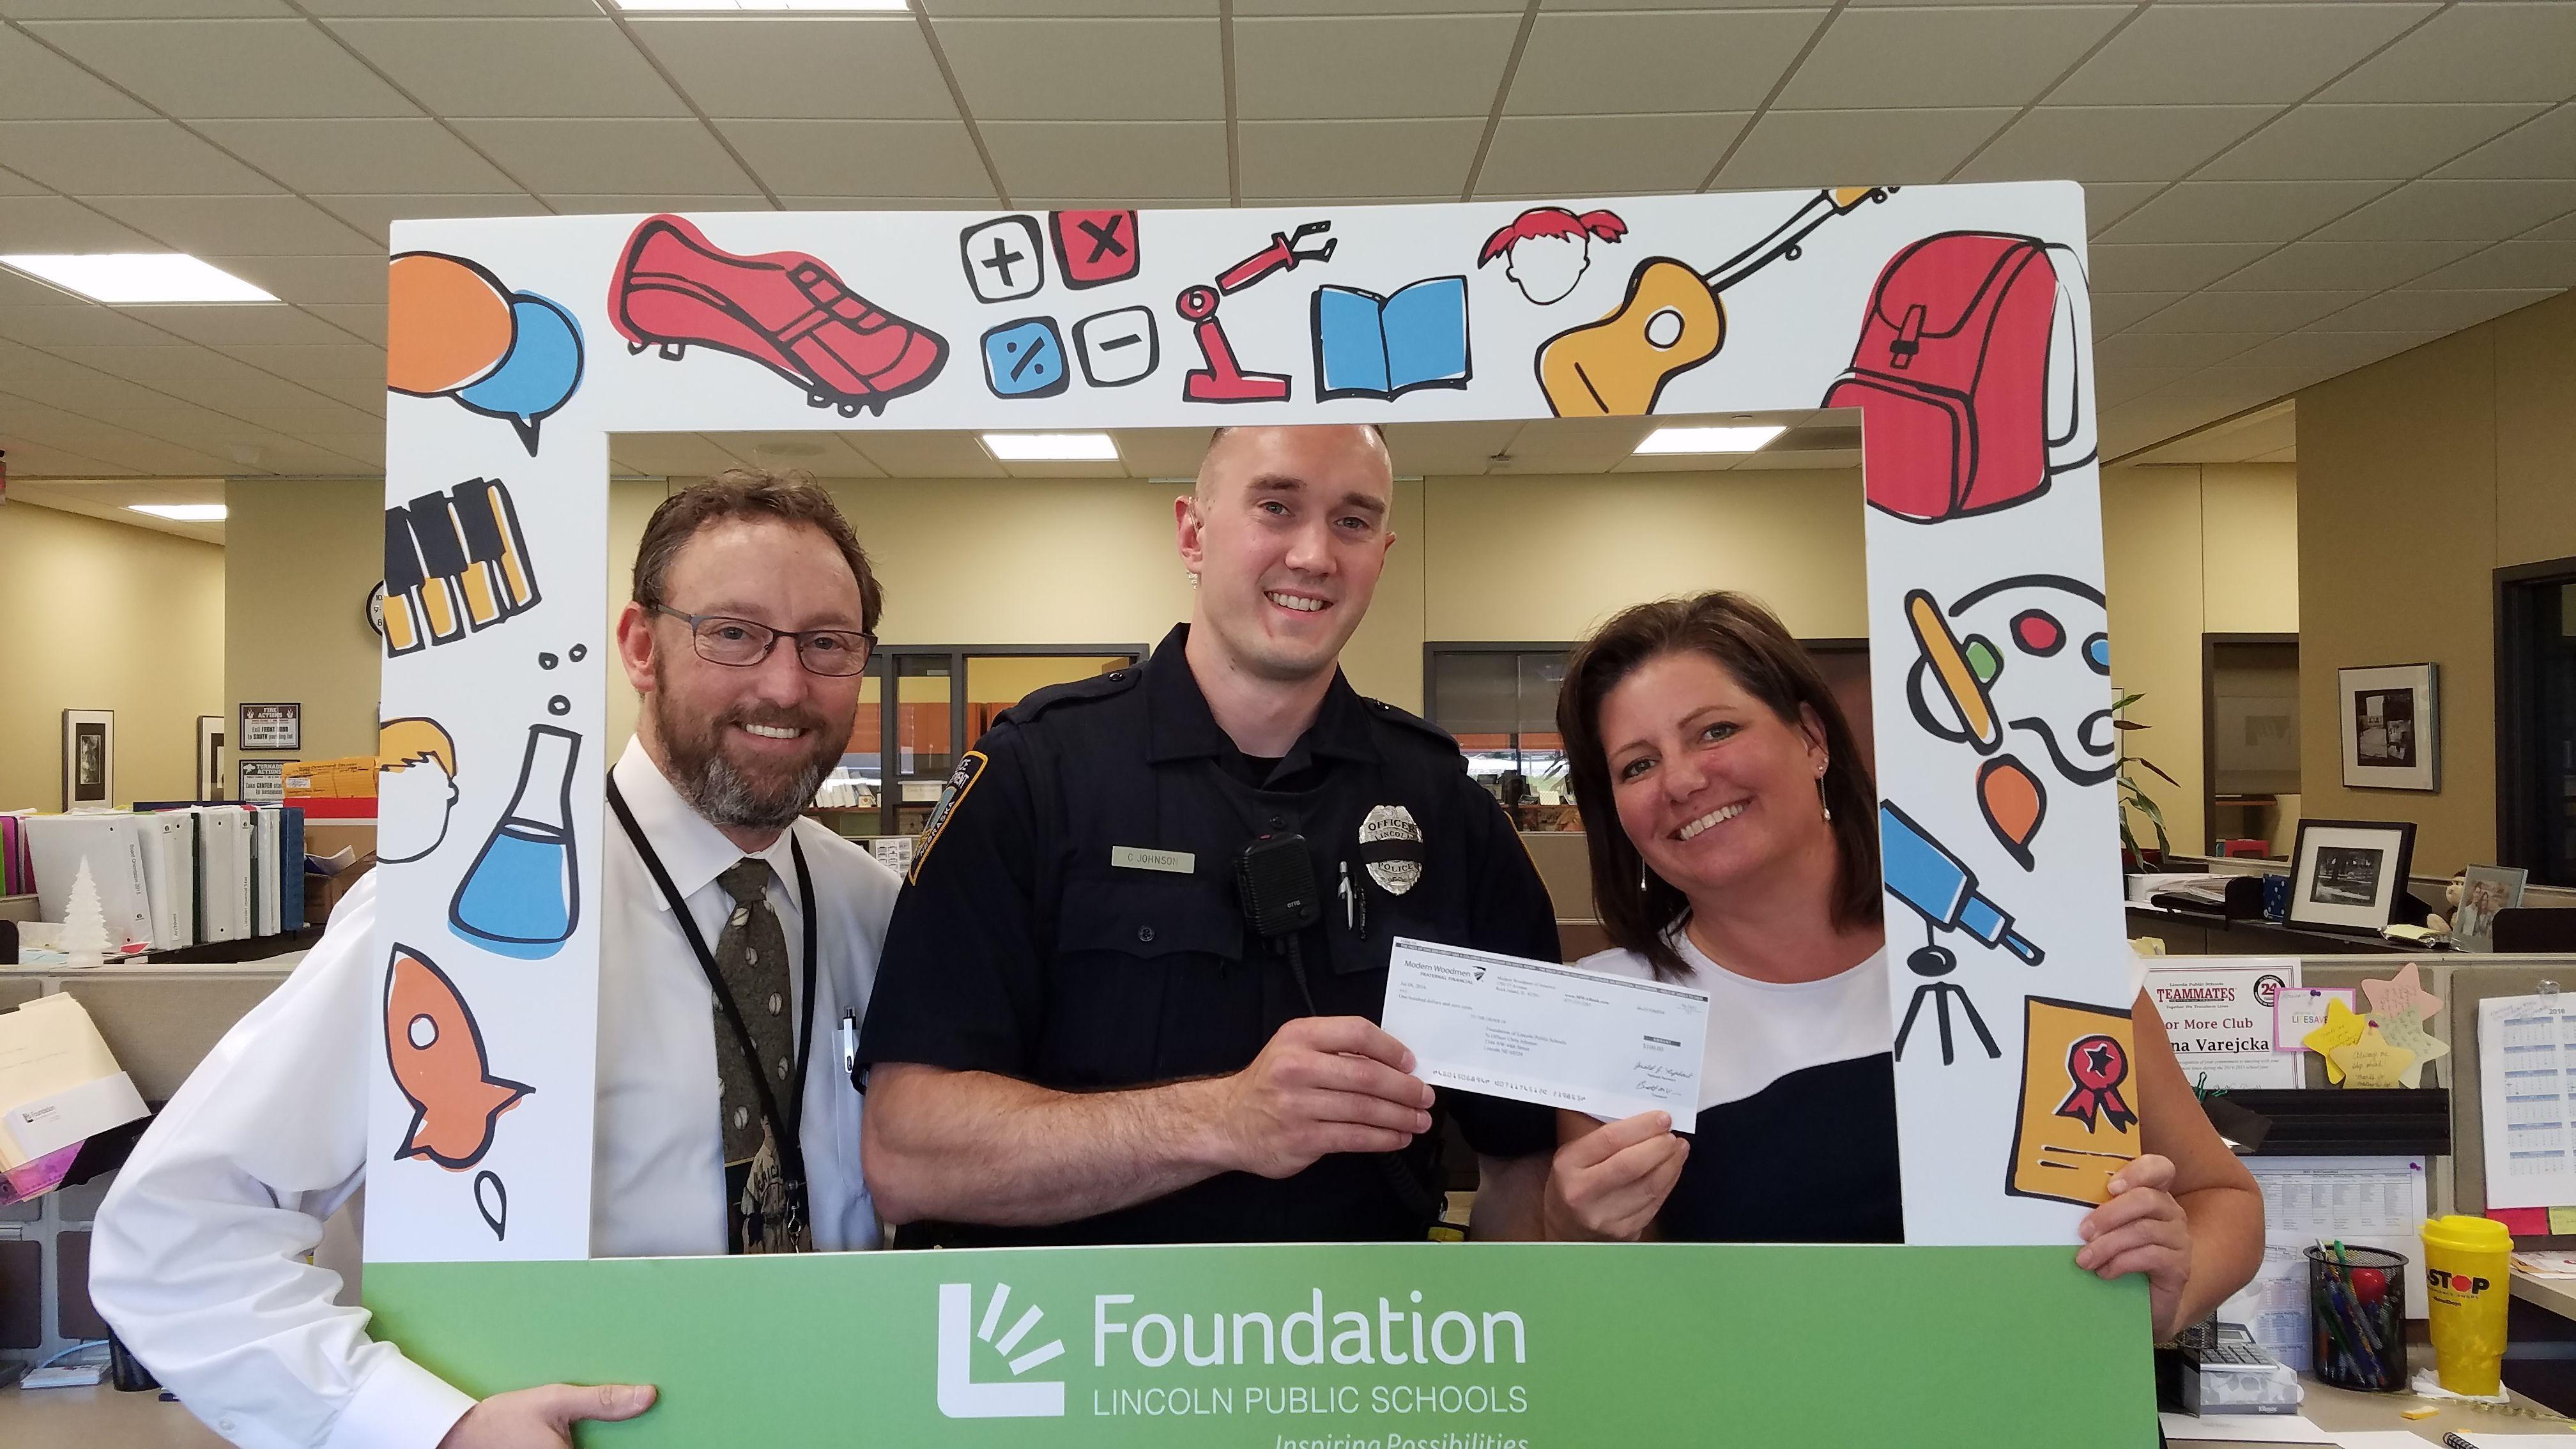 Local Hero Donates Award to LPS Students